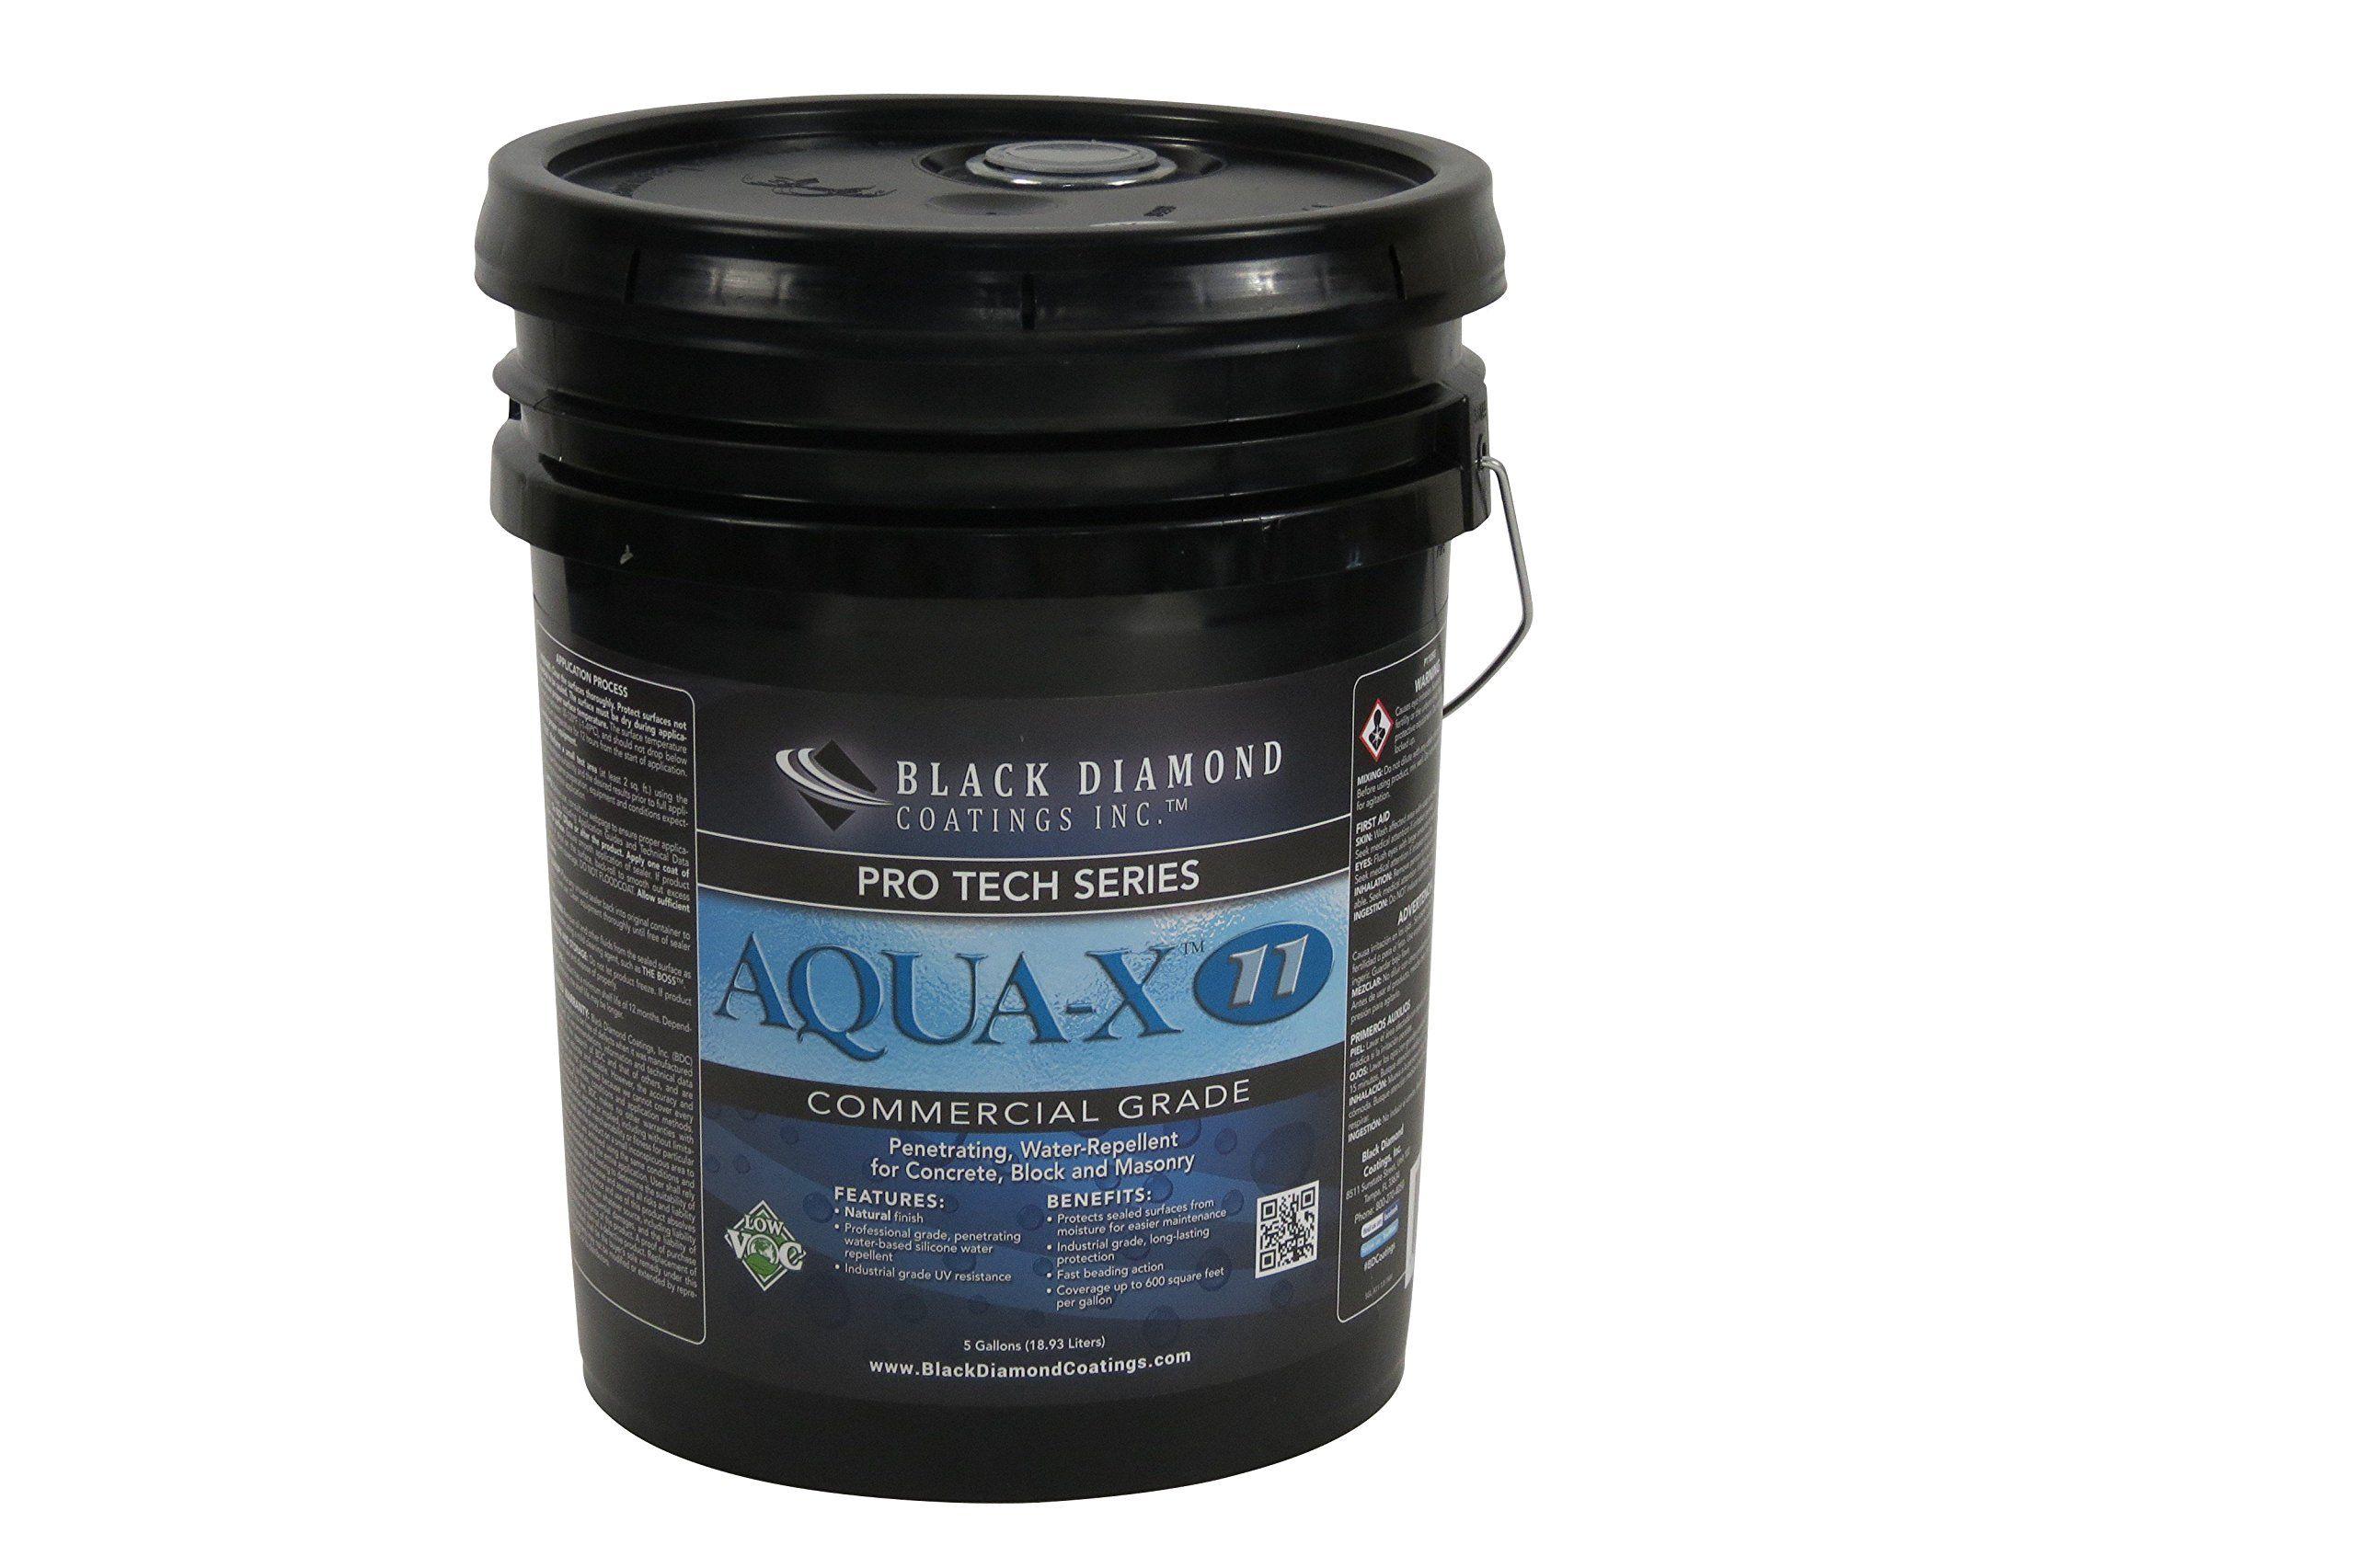 Aquax 11 Commercial Grade Concrete Masonry Clear Penetrating Concrete Sealer And Water Repellent Allinone Pro Tech Ser Wood Sealer Concrete Sealer Clay Pavers